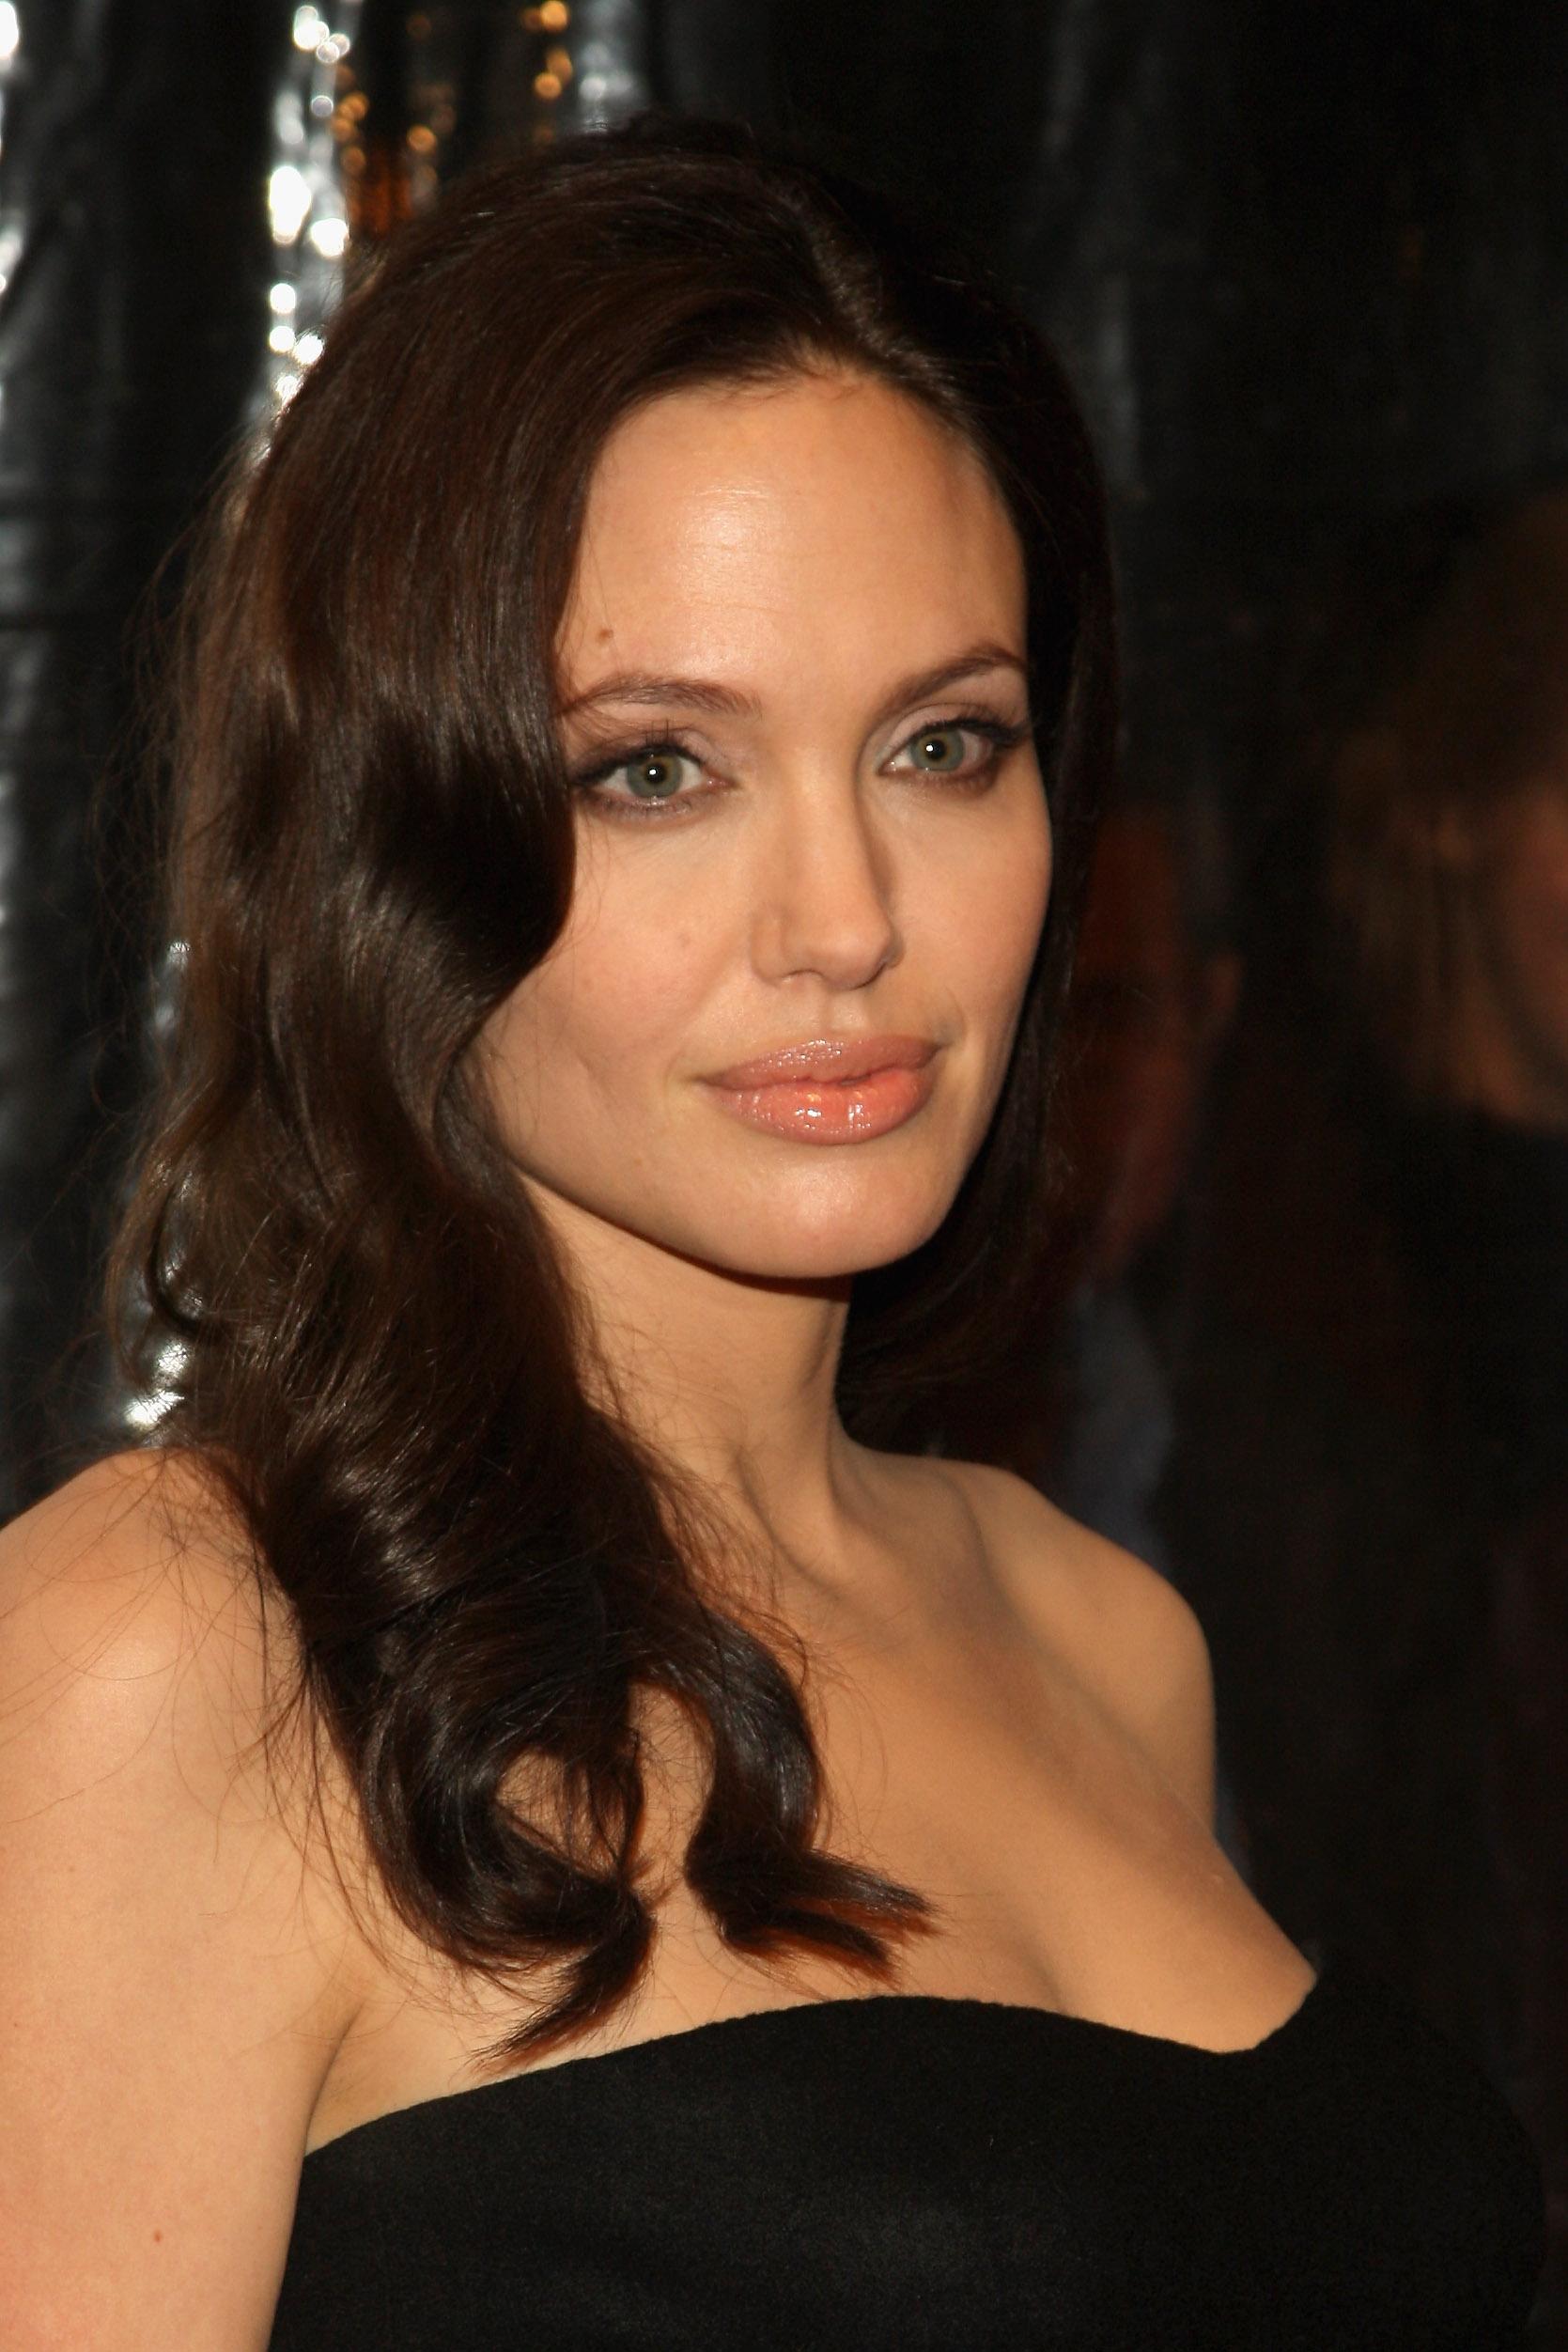 02137_Celebutopia-Angelina_Jolie-The_Changeling_premiere_in_New_York_City-10_122_348lo.jpg